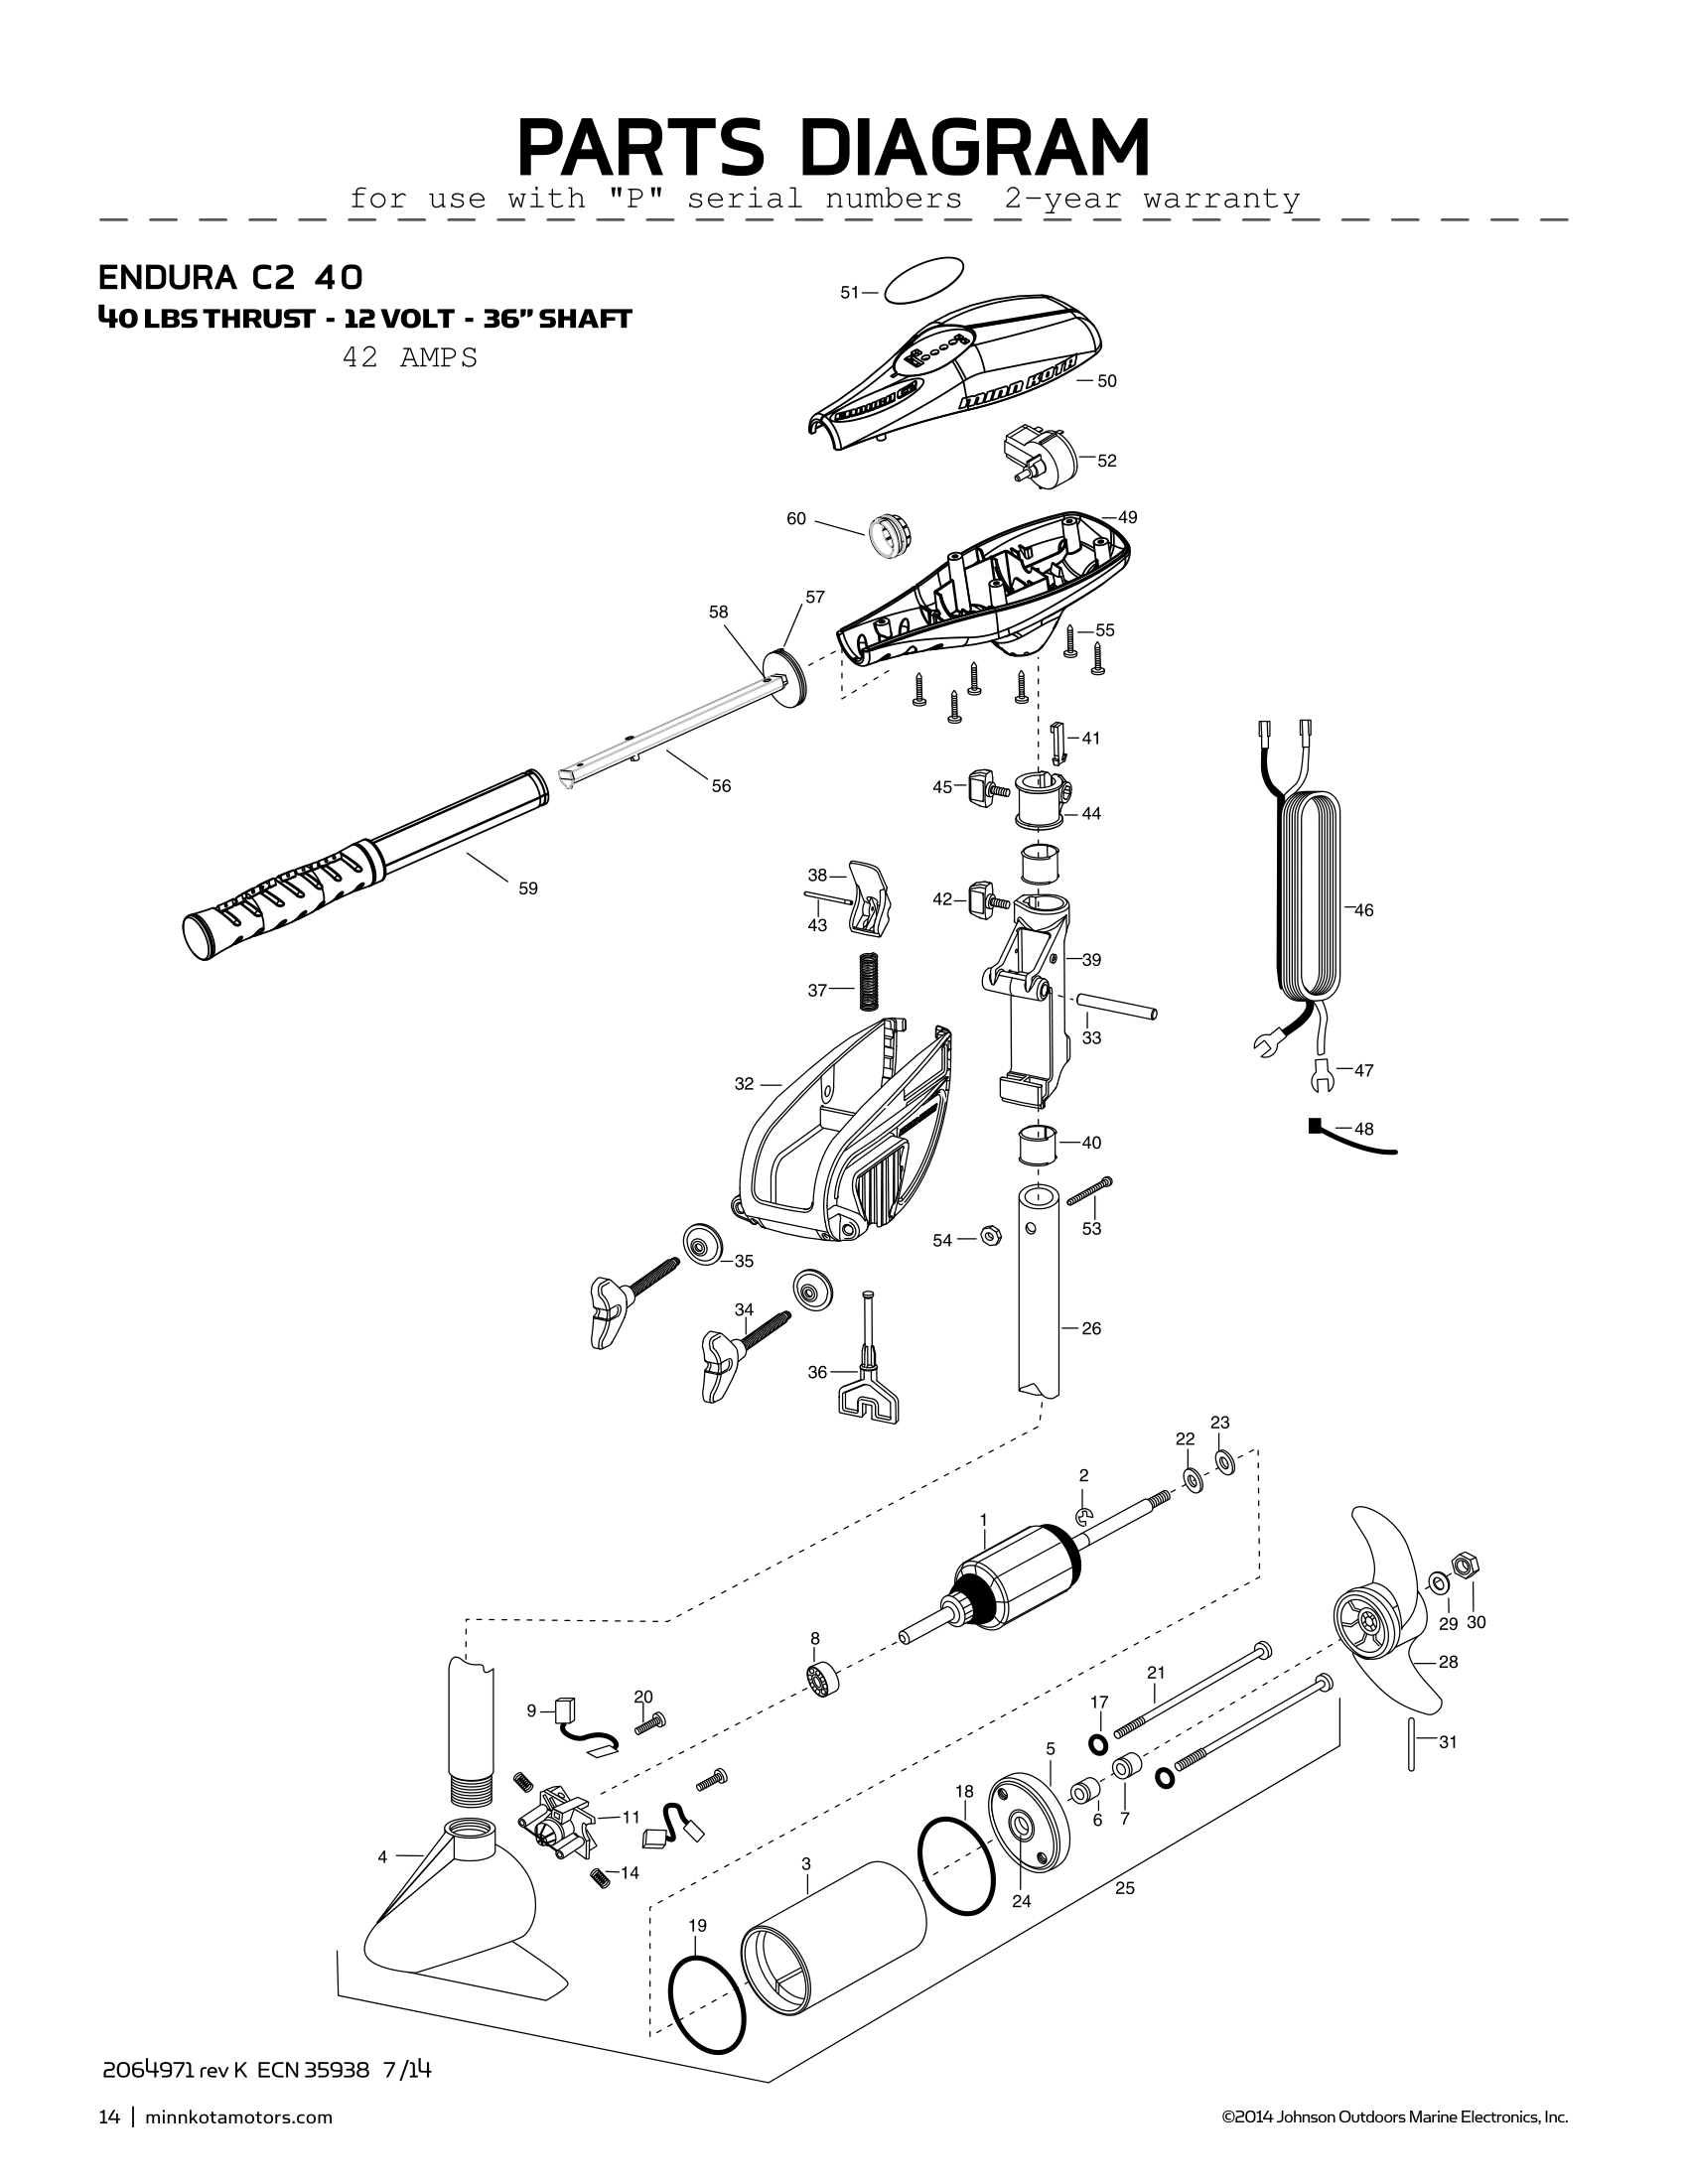 Minn Kota 565 Diagram Data Schematics Wiring 5 Speed Switch Trusted Diagrams U2022 Rh Radkan Co Replacement Parts List